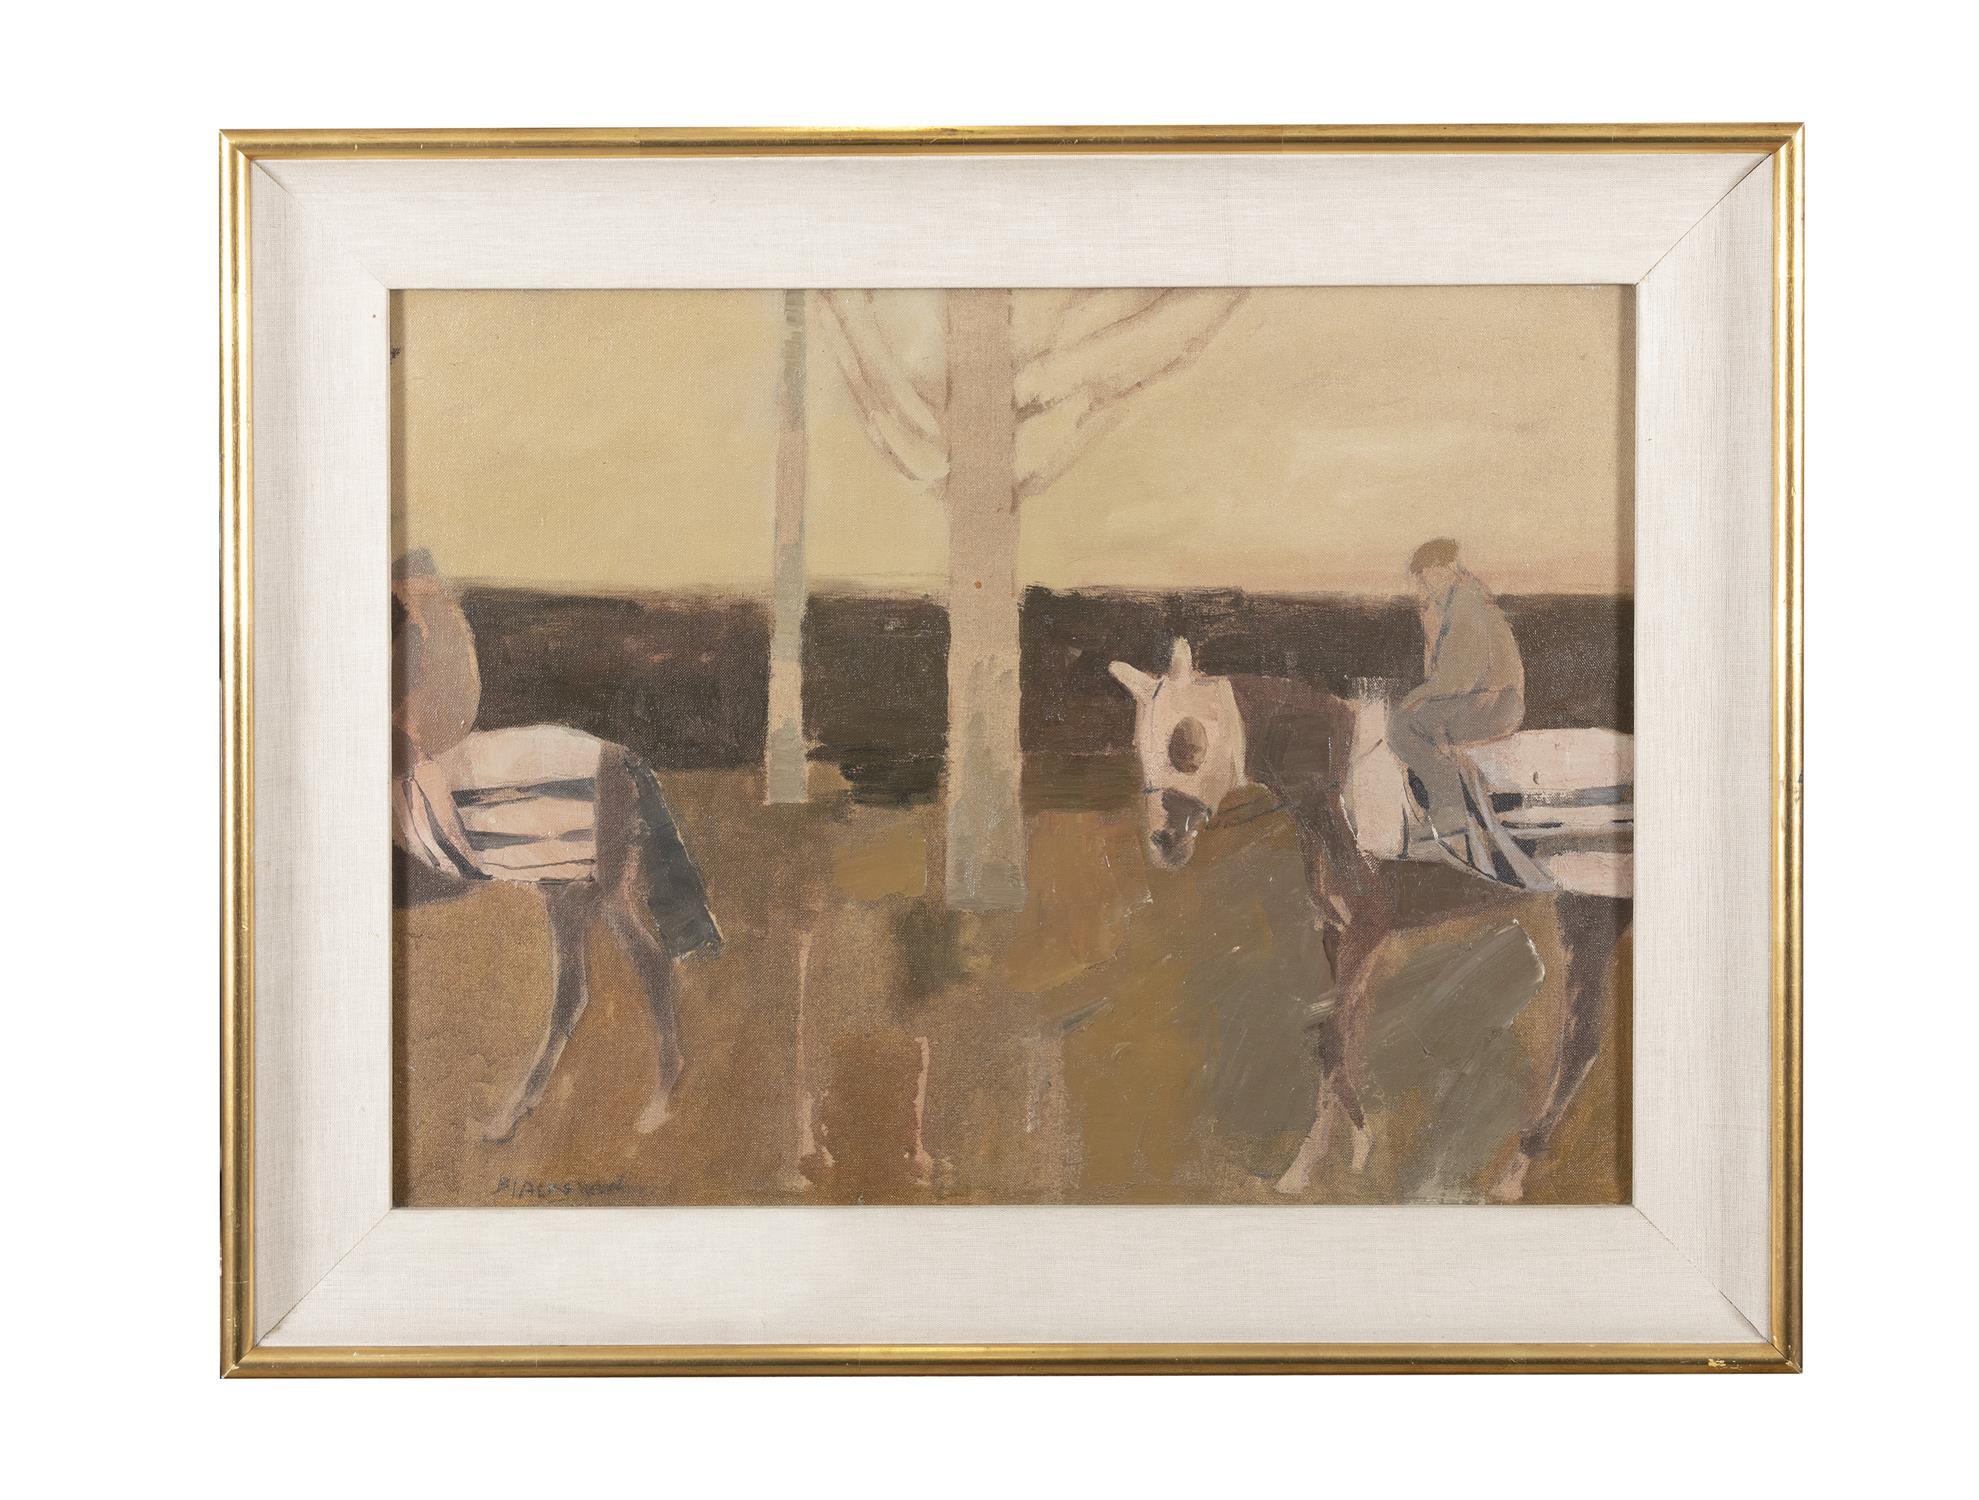 Basil Blackshaw HRHA RUA (1932-2016) Exercising Race Horses Oil on canvas, 45 x 60cm (17¾ x - Image 2 of 5